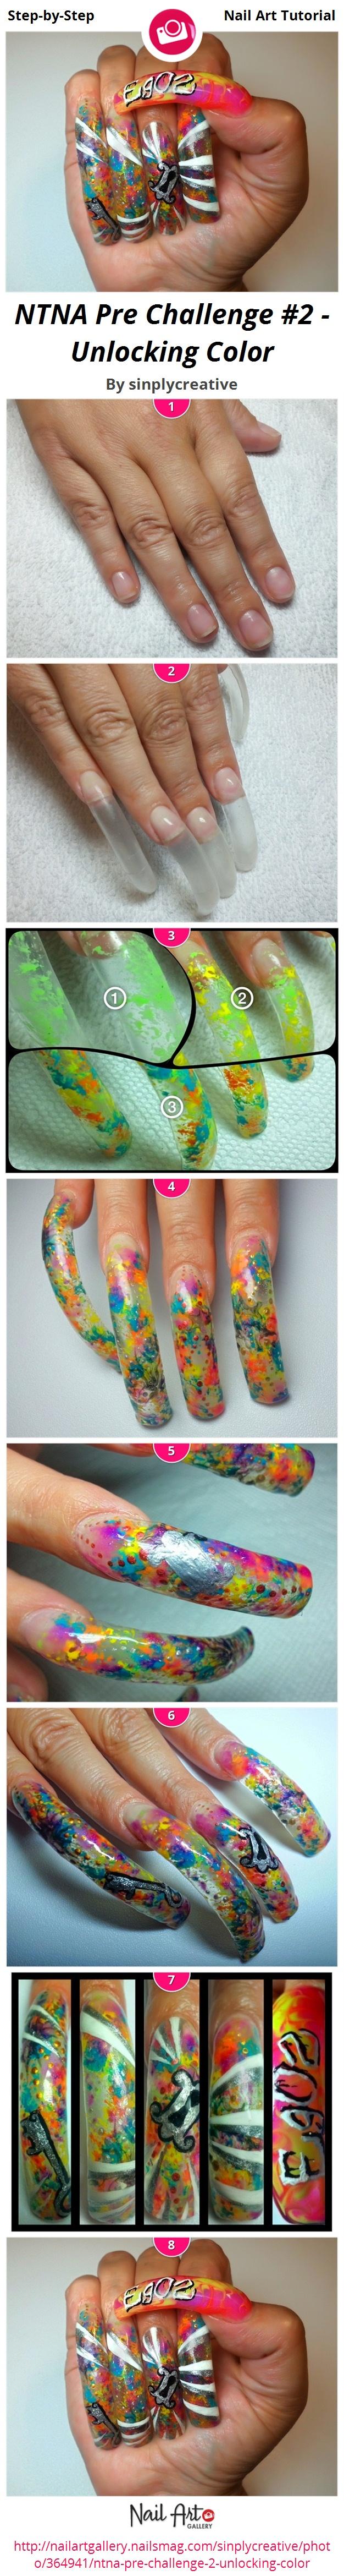 NTNA Pre Challenge #2 - Unlocking Color - Nail Art Gallery